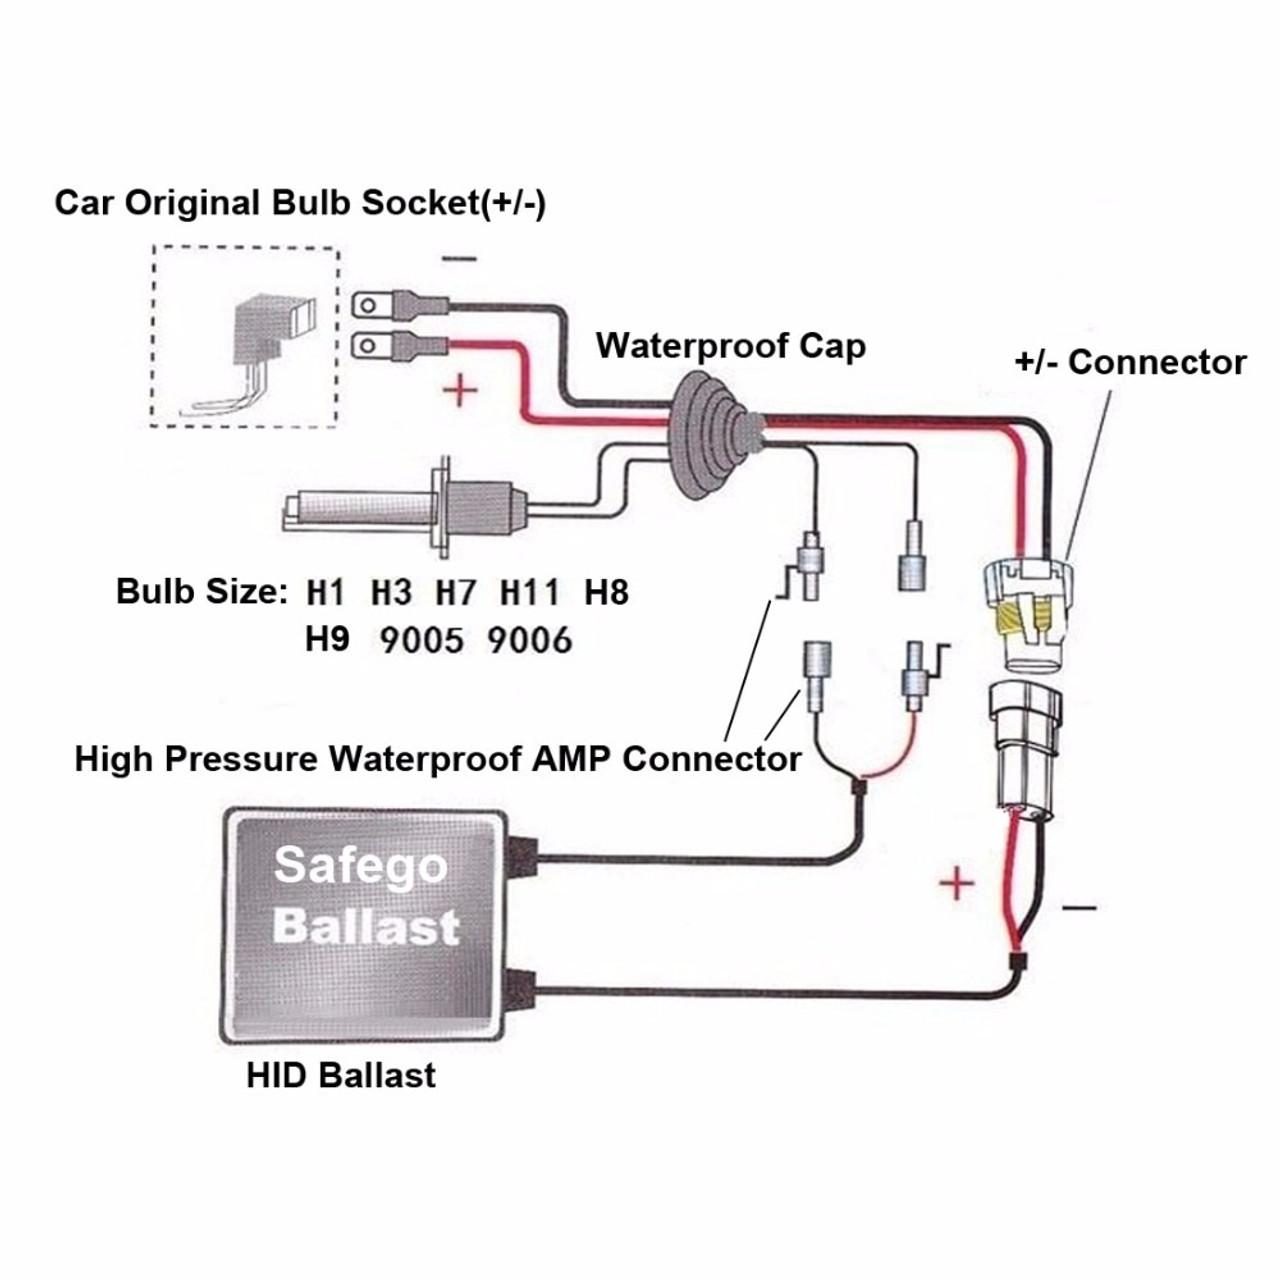 medium resolution of slim ballast hid kit xenon 35w h4 h7 h11 xenon hid conversion kit h1 corolla diy diy non hid 9005 9006 to h4 conversion diagram